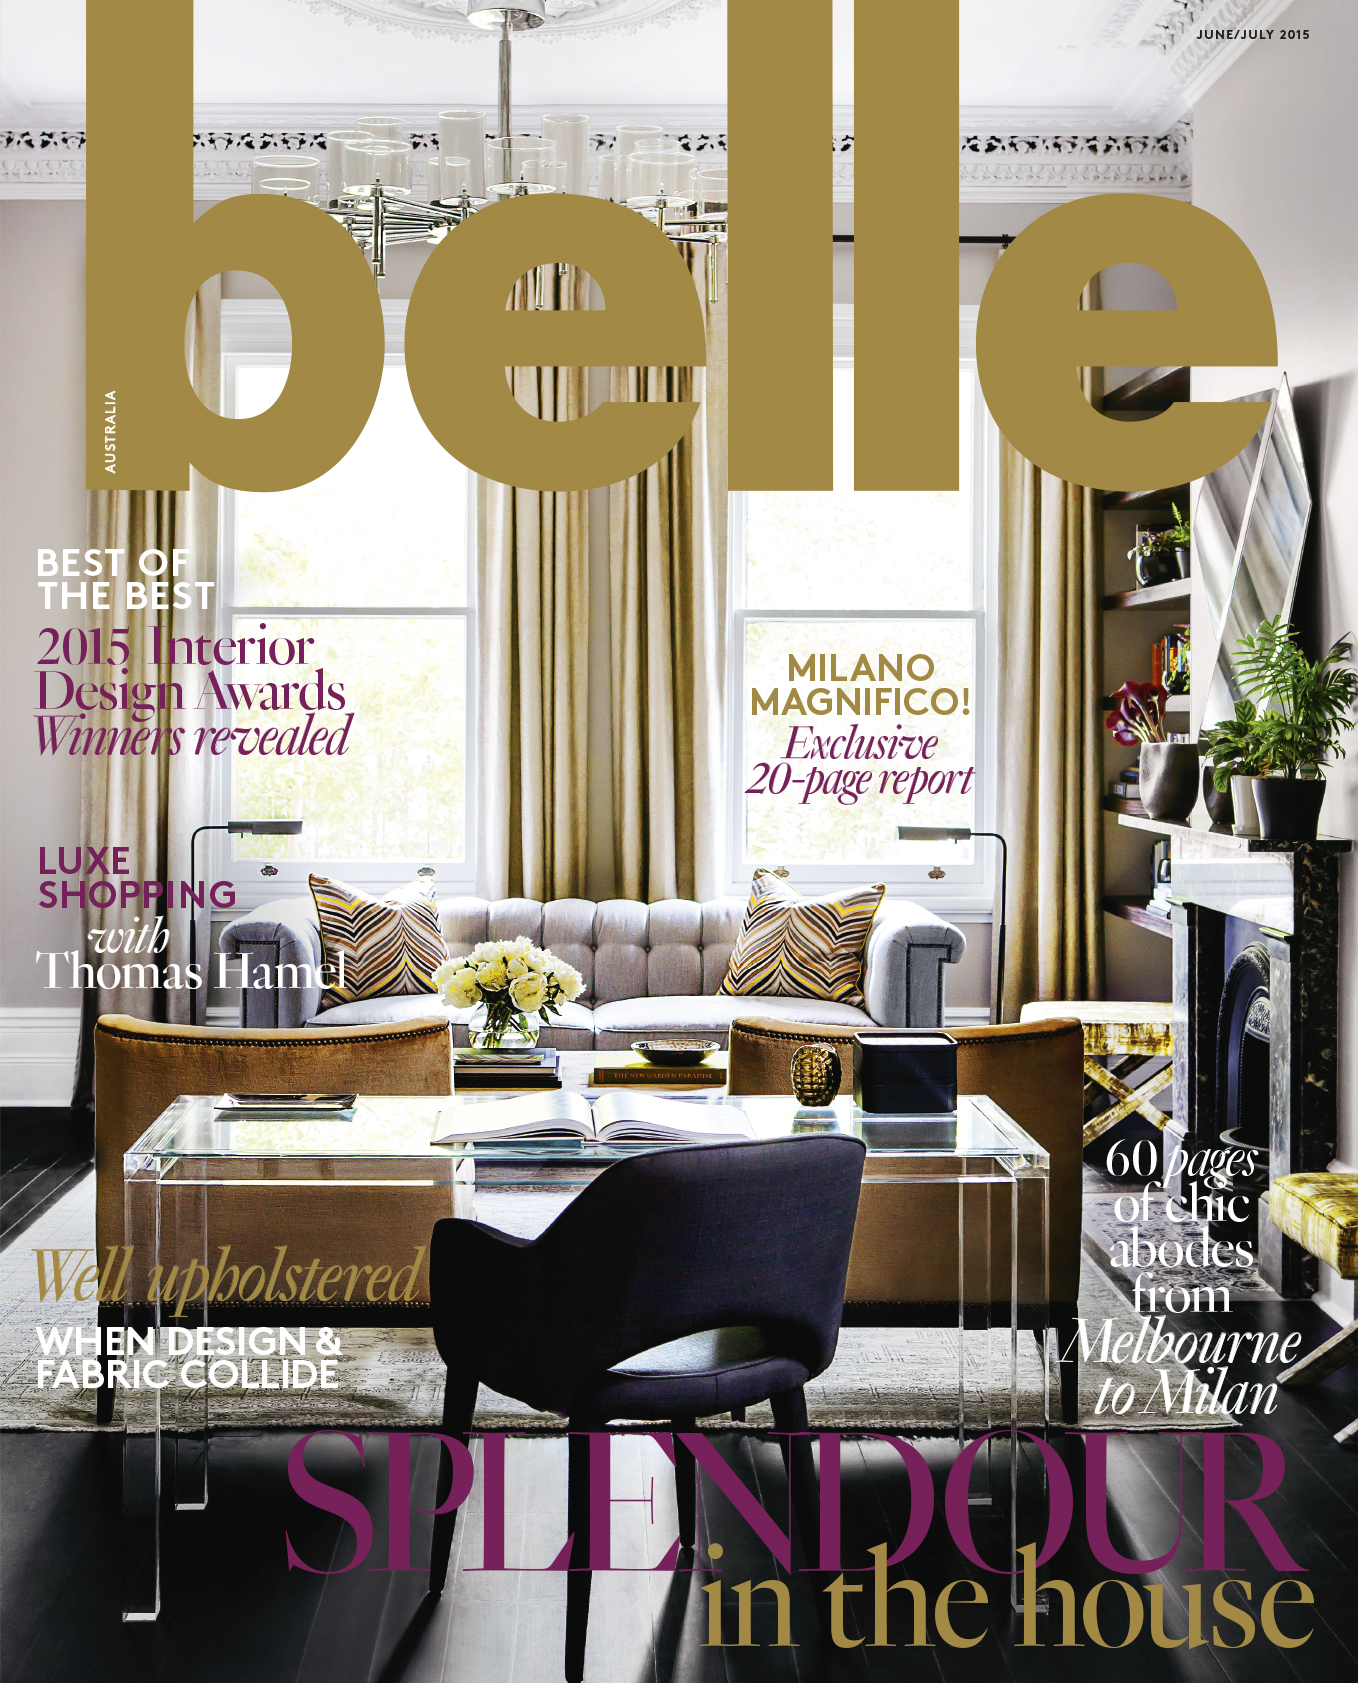 Belle Magazine 2015 - Milan Report